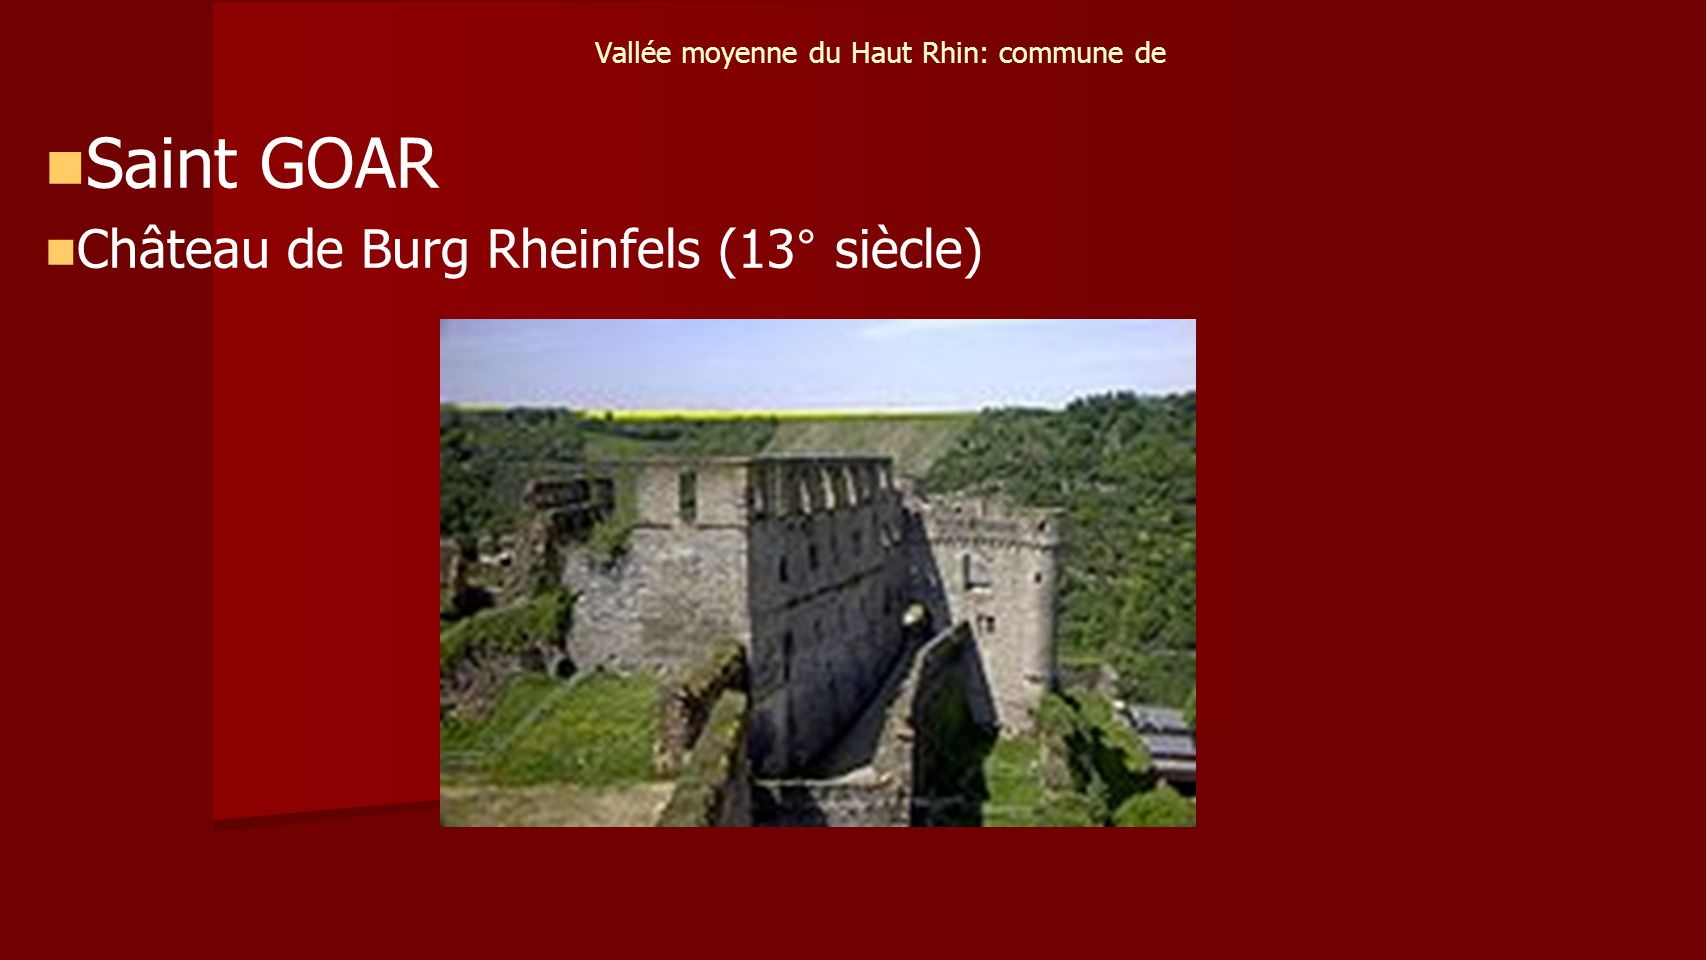 Vallée moyenne du Haut Rhin: commune de Saint GOAR Château de Burg Rheinfels (13° siècle)